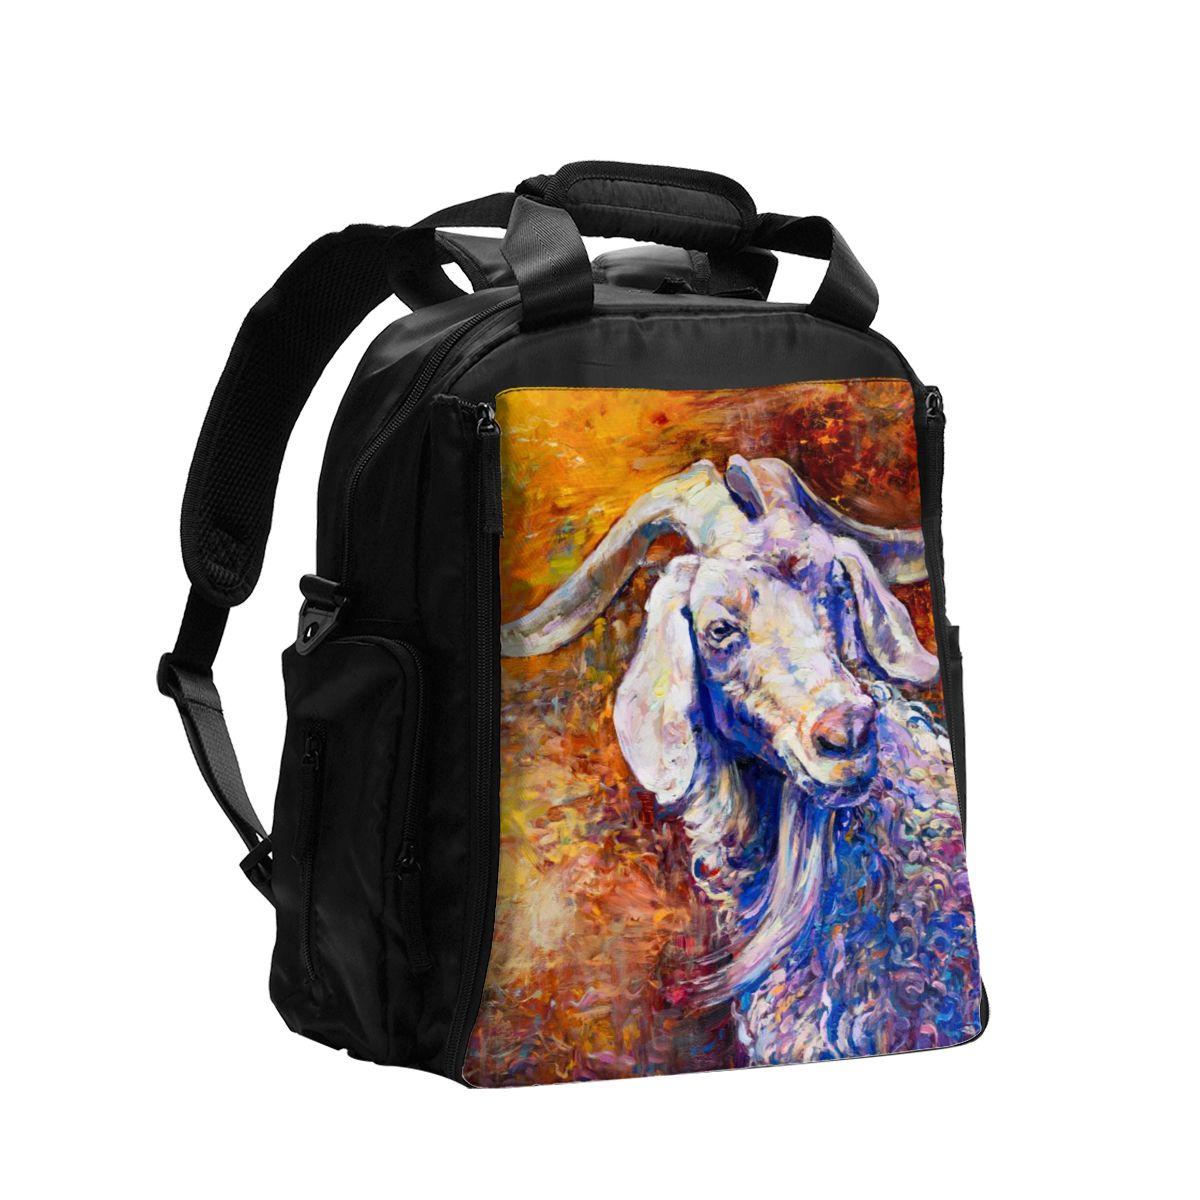 Bolsa de pañales para bebés retrato de cabra bolsa de maternidad para pañales desechables reutilizables de secado húmedo bolsa de doble ASA